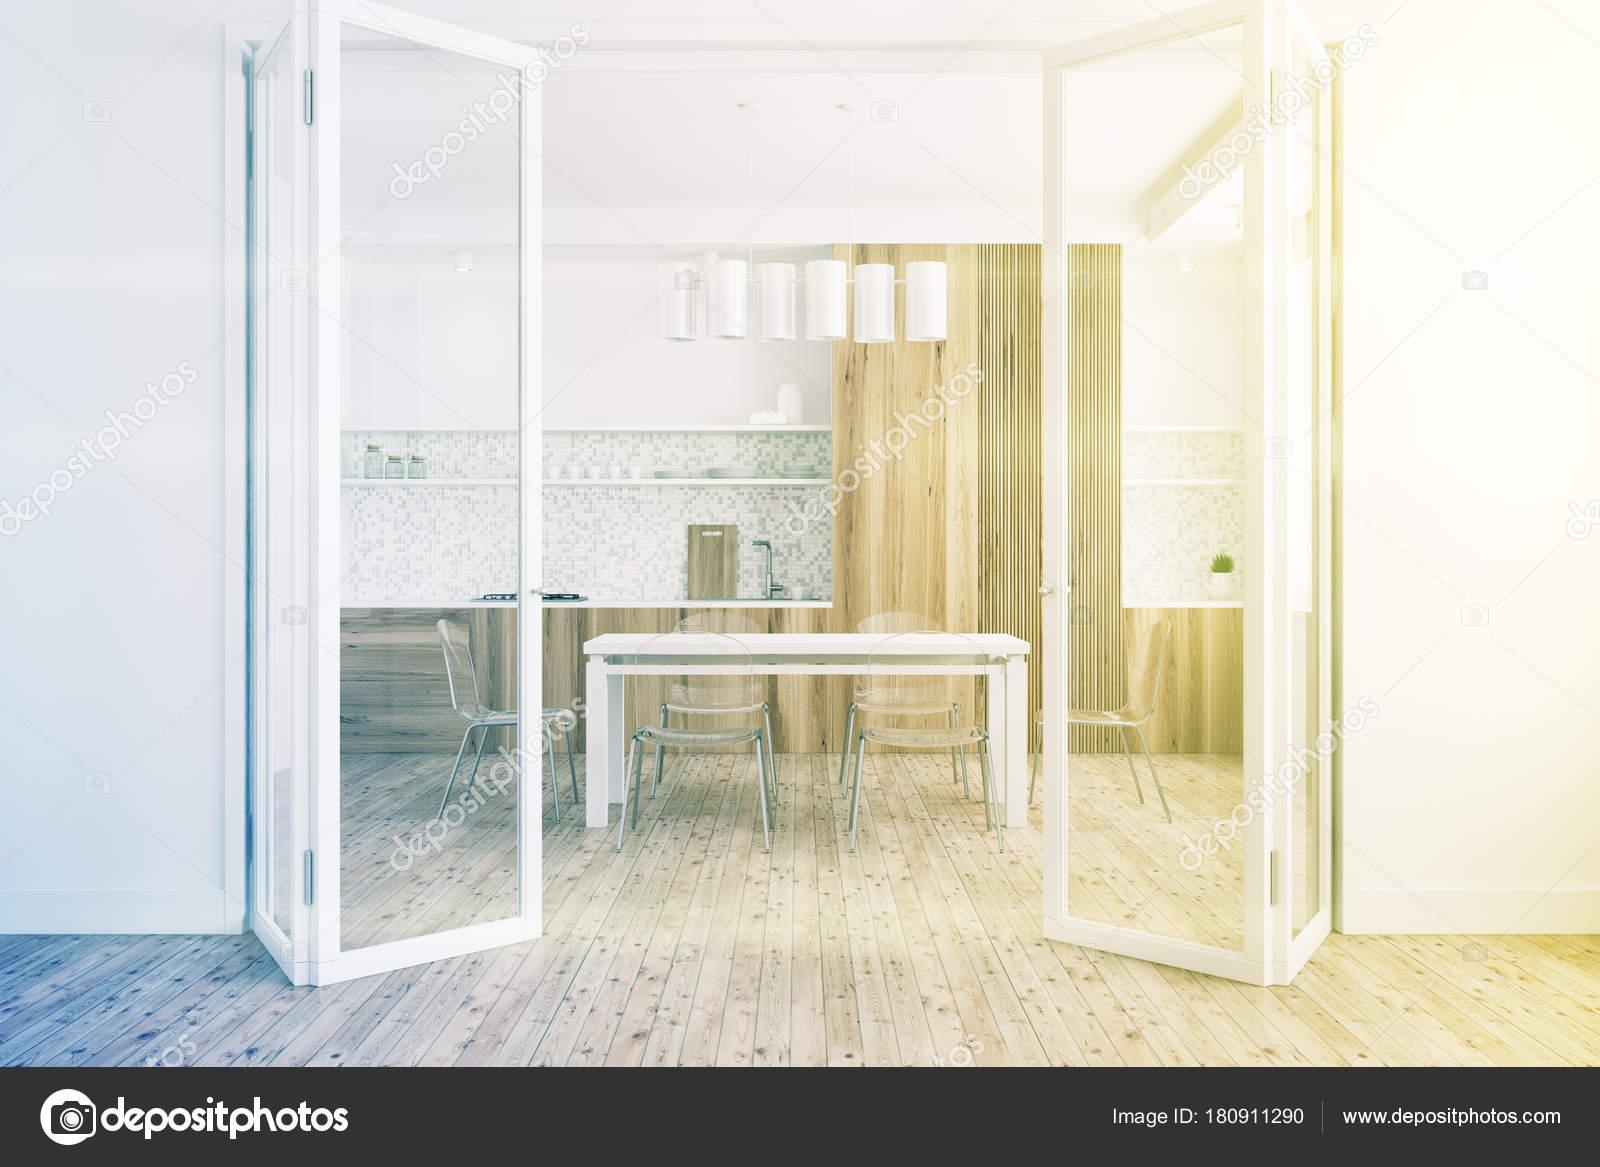 White Dining Room Glass Door Toned Stock Photo